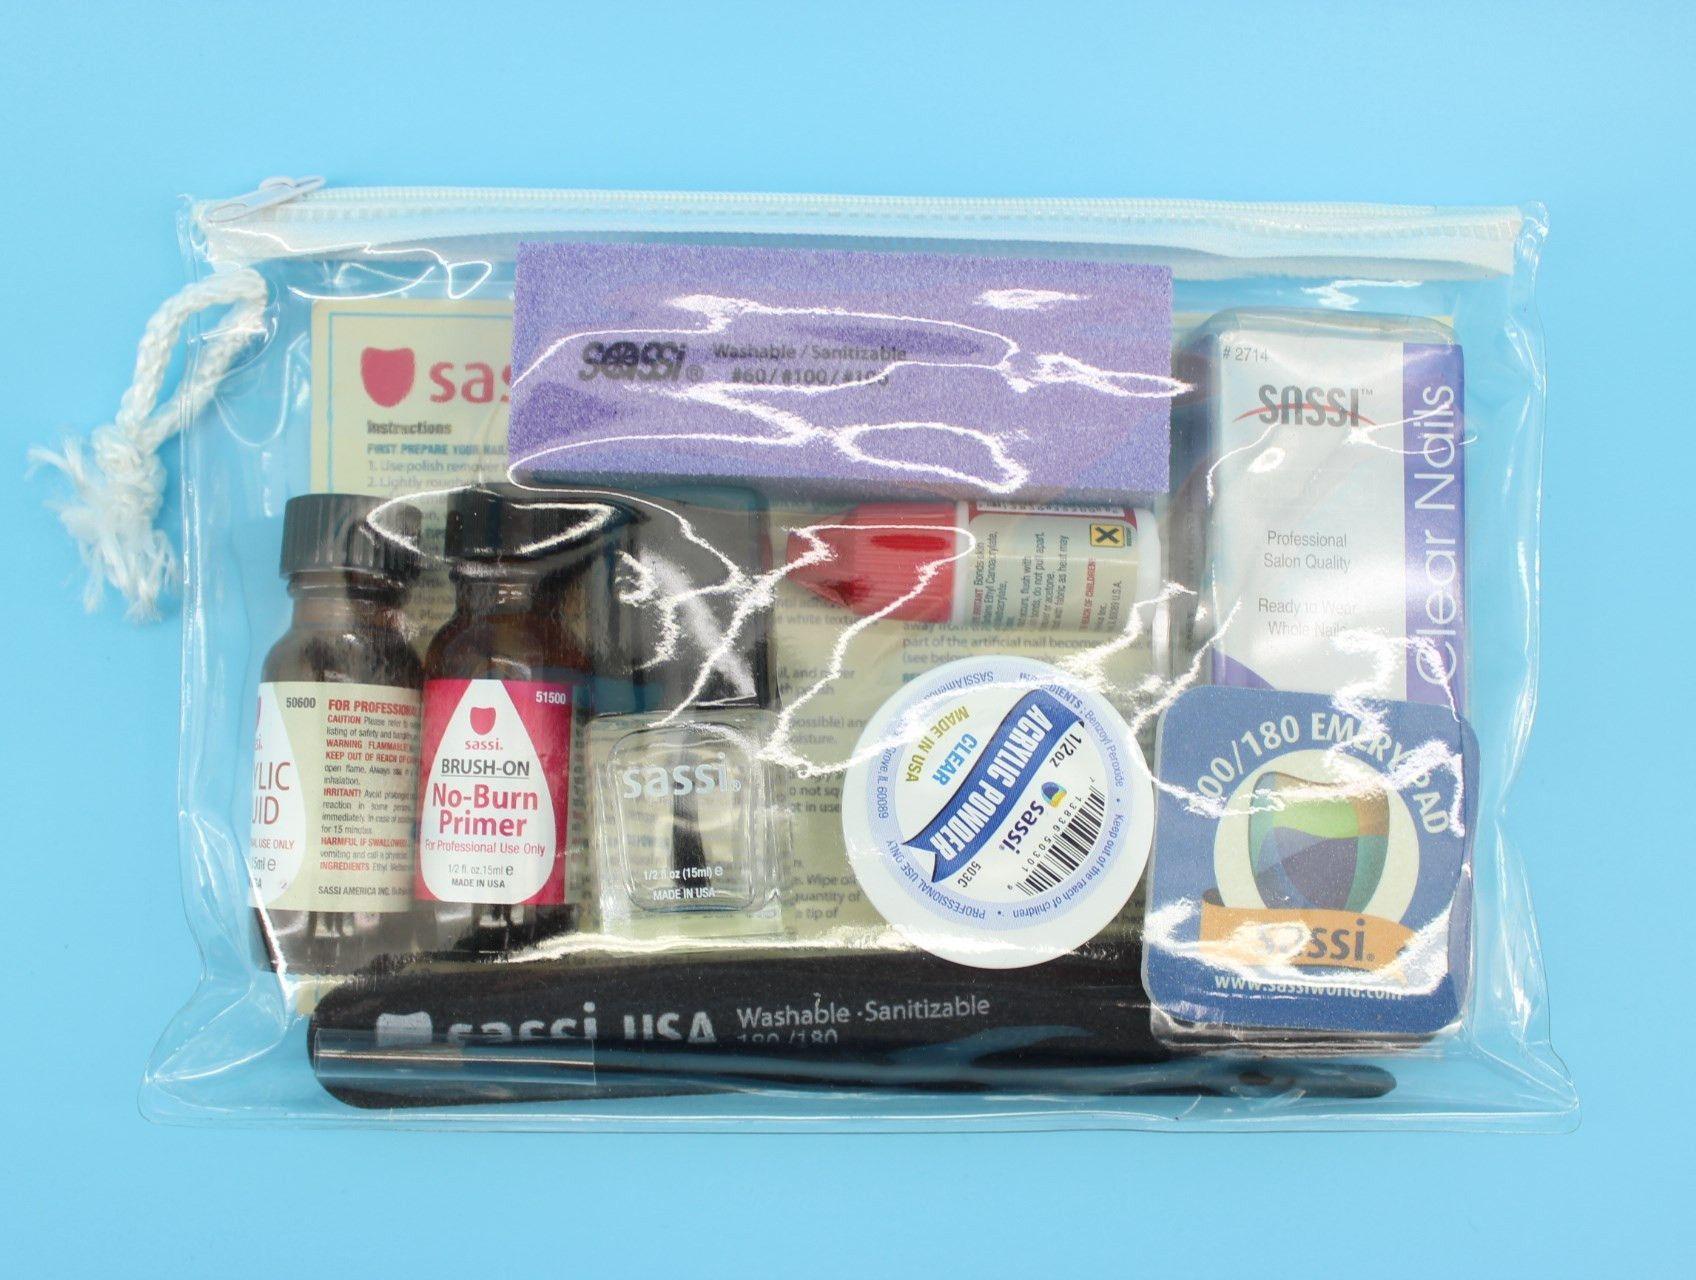 Sassi, Acrylic Nails Starter Kit   Acrylic nail starter kit and Products